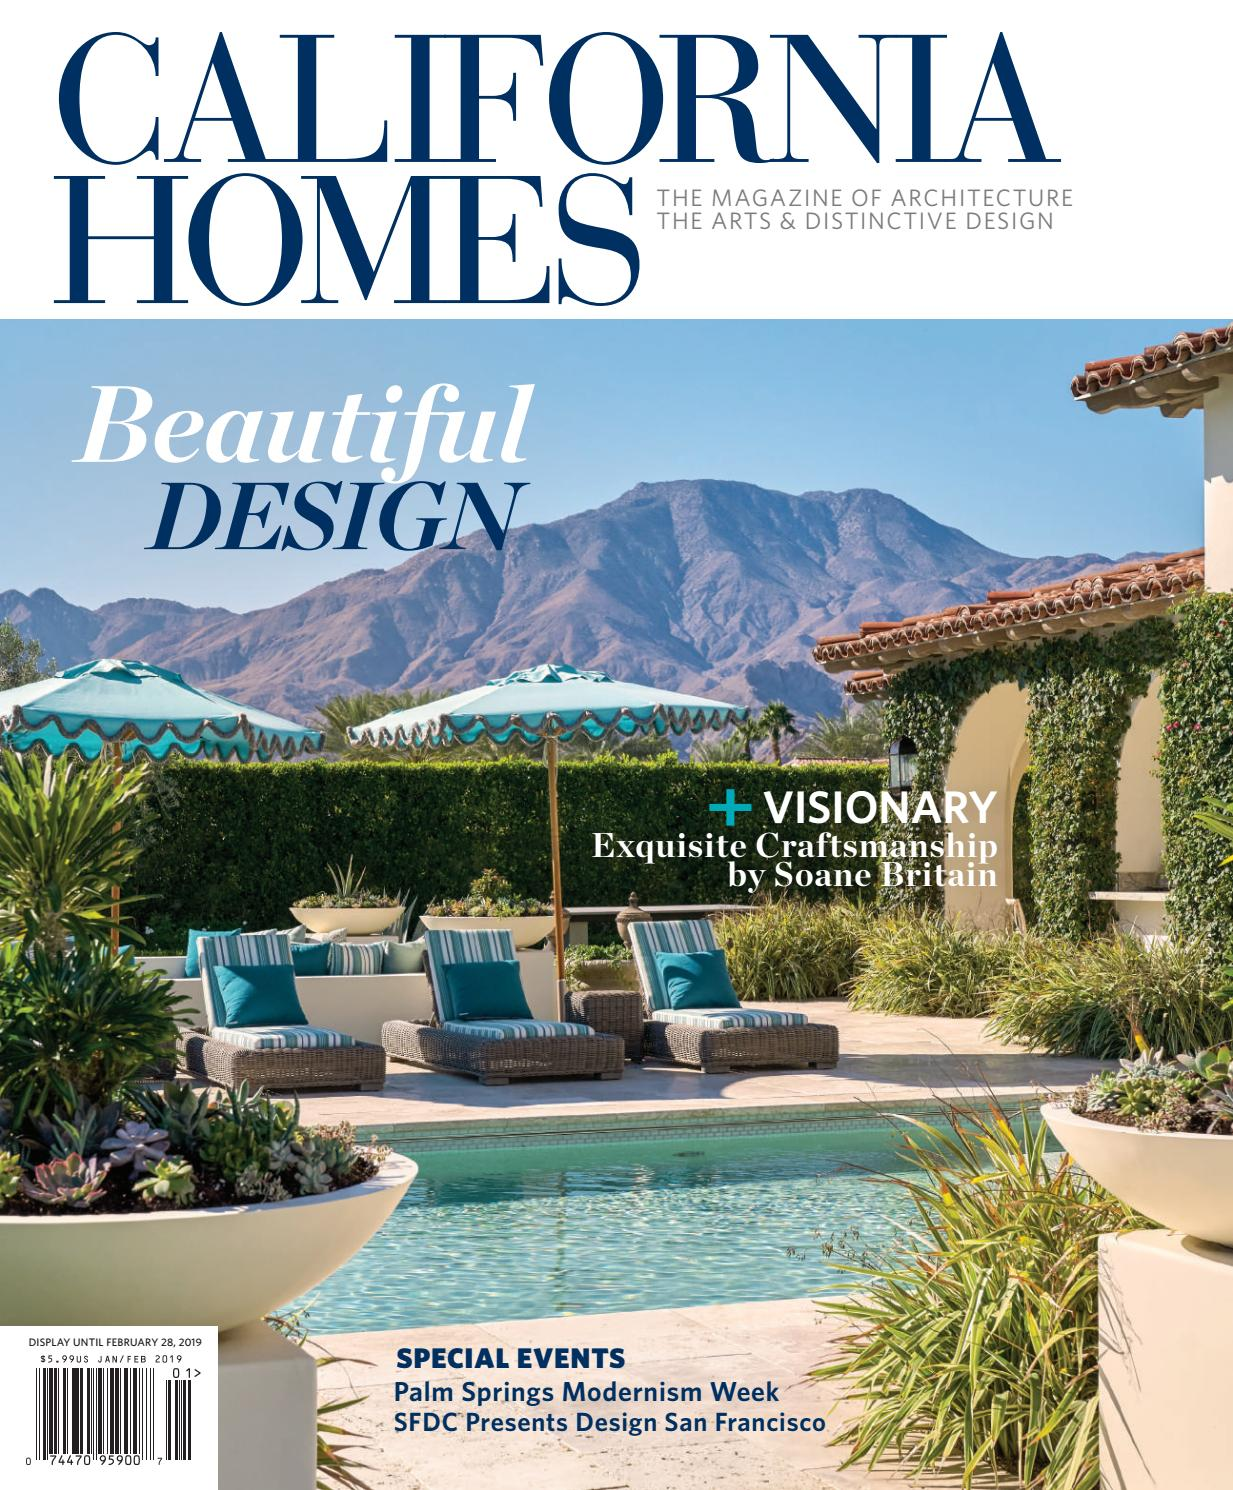 California Homes - January/February 2019 by California Homes